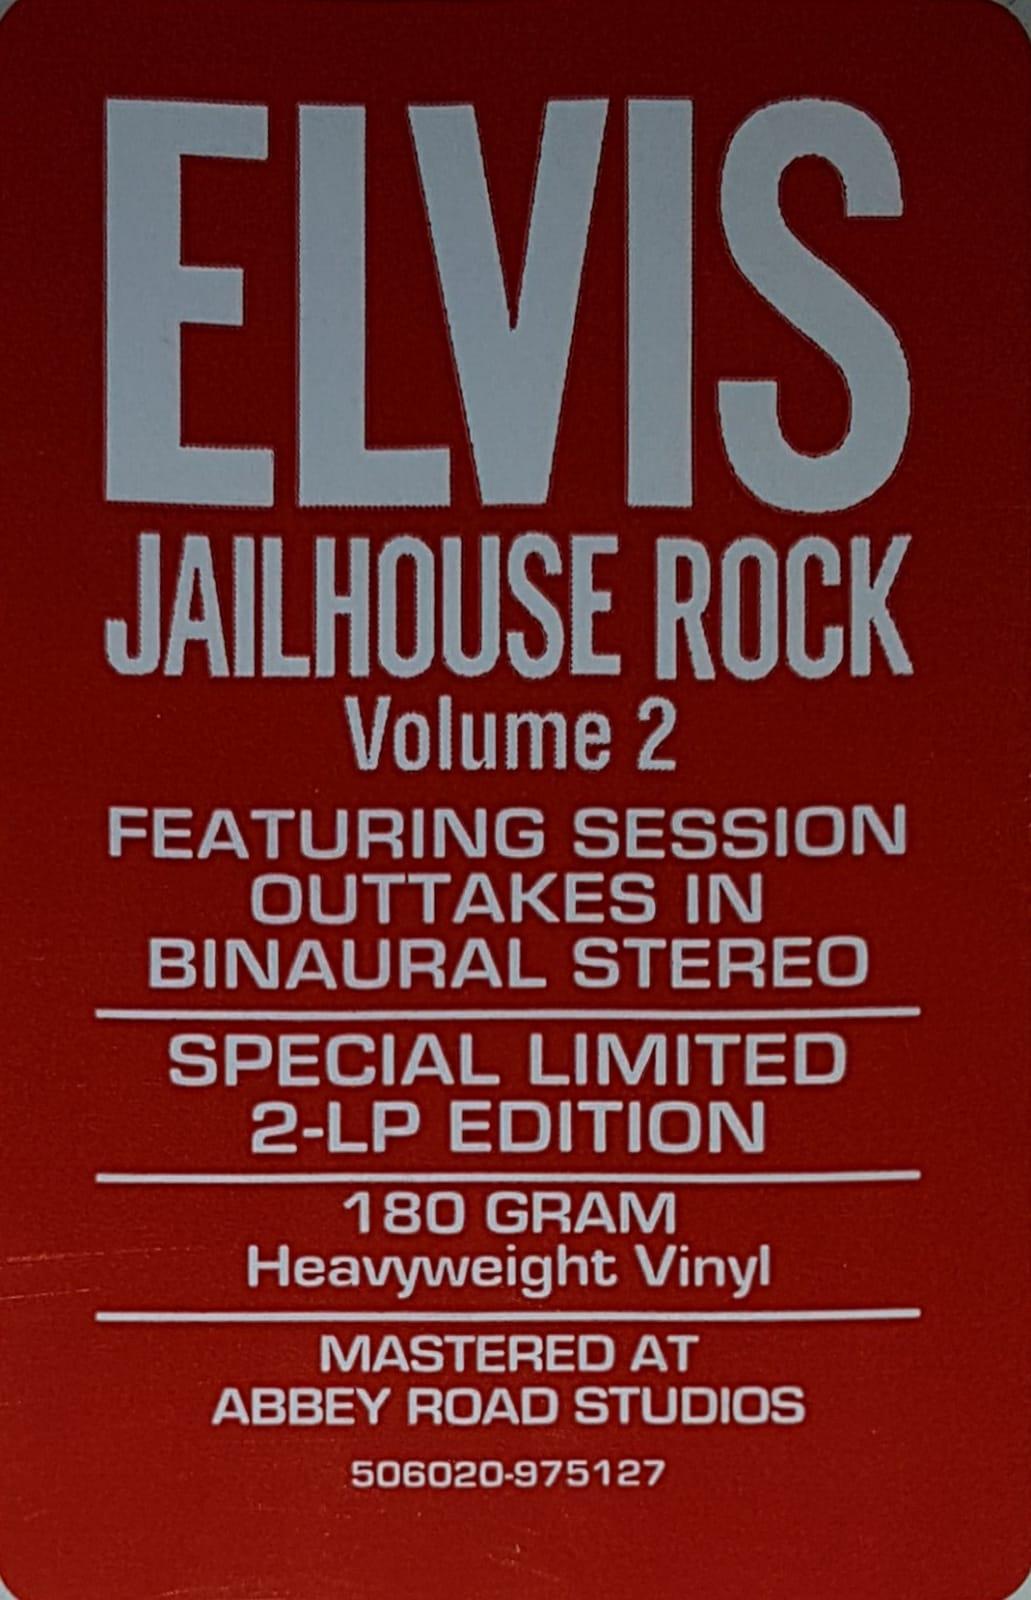 JAILHOUSE ROCK VOL. 2 Jailhouserock02ftd025mkc6